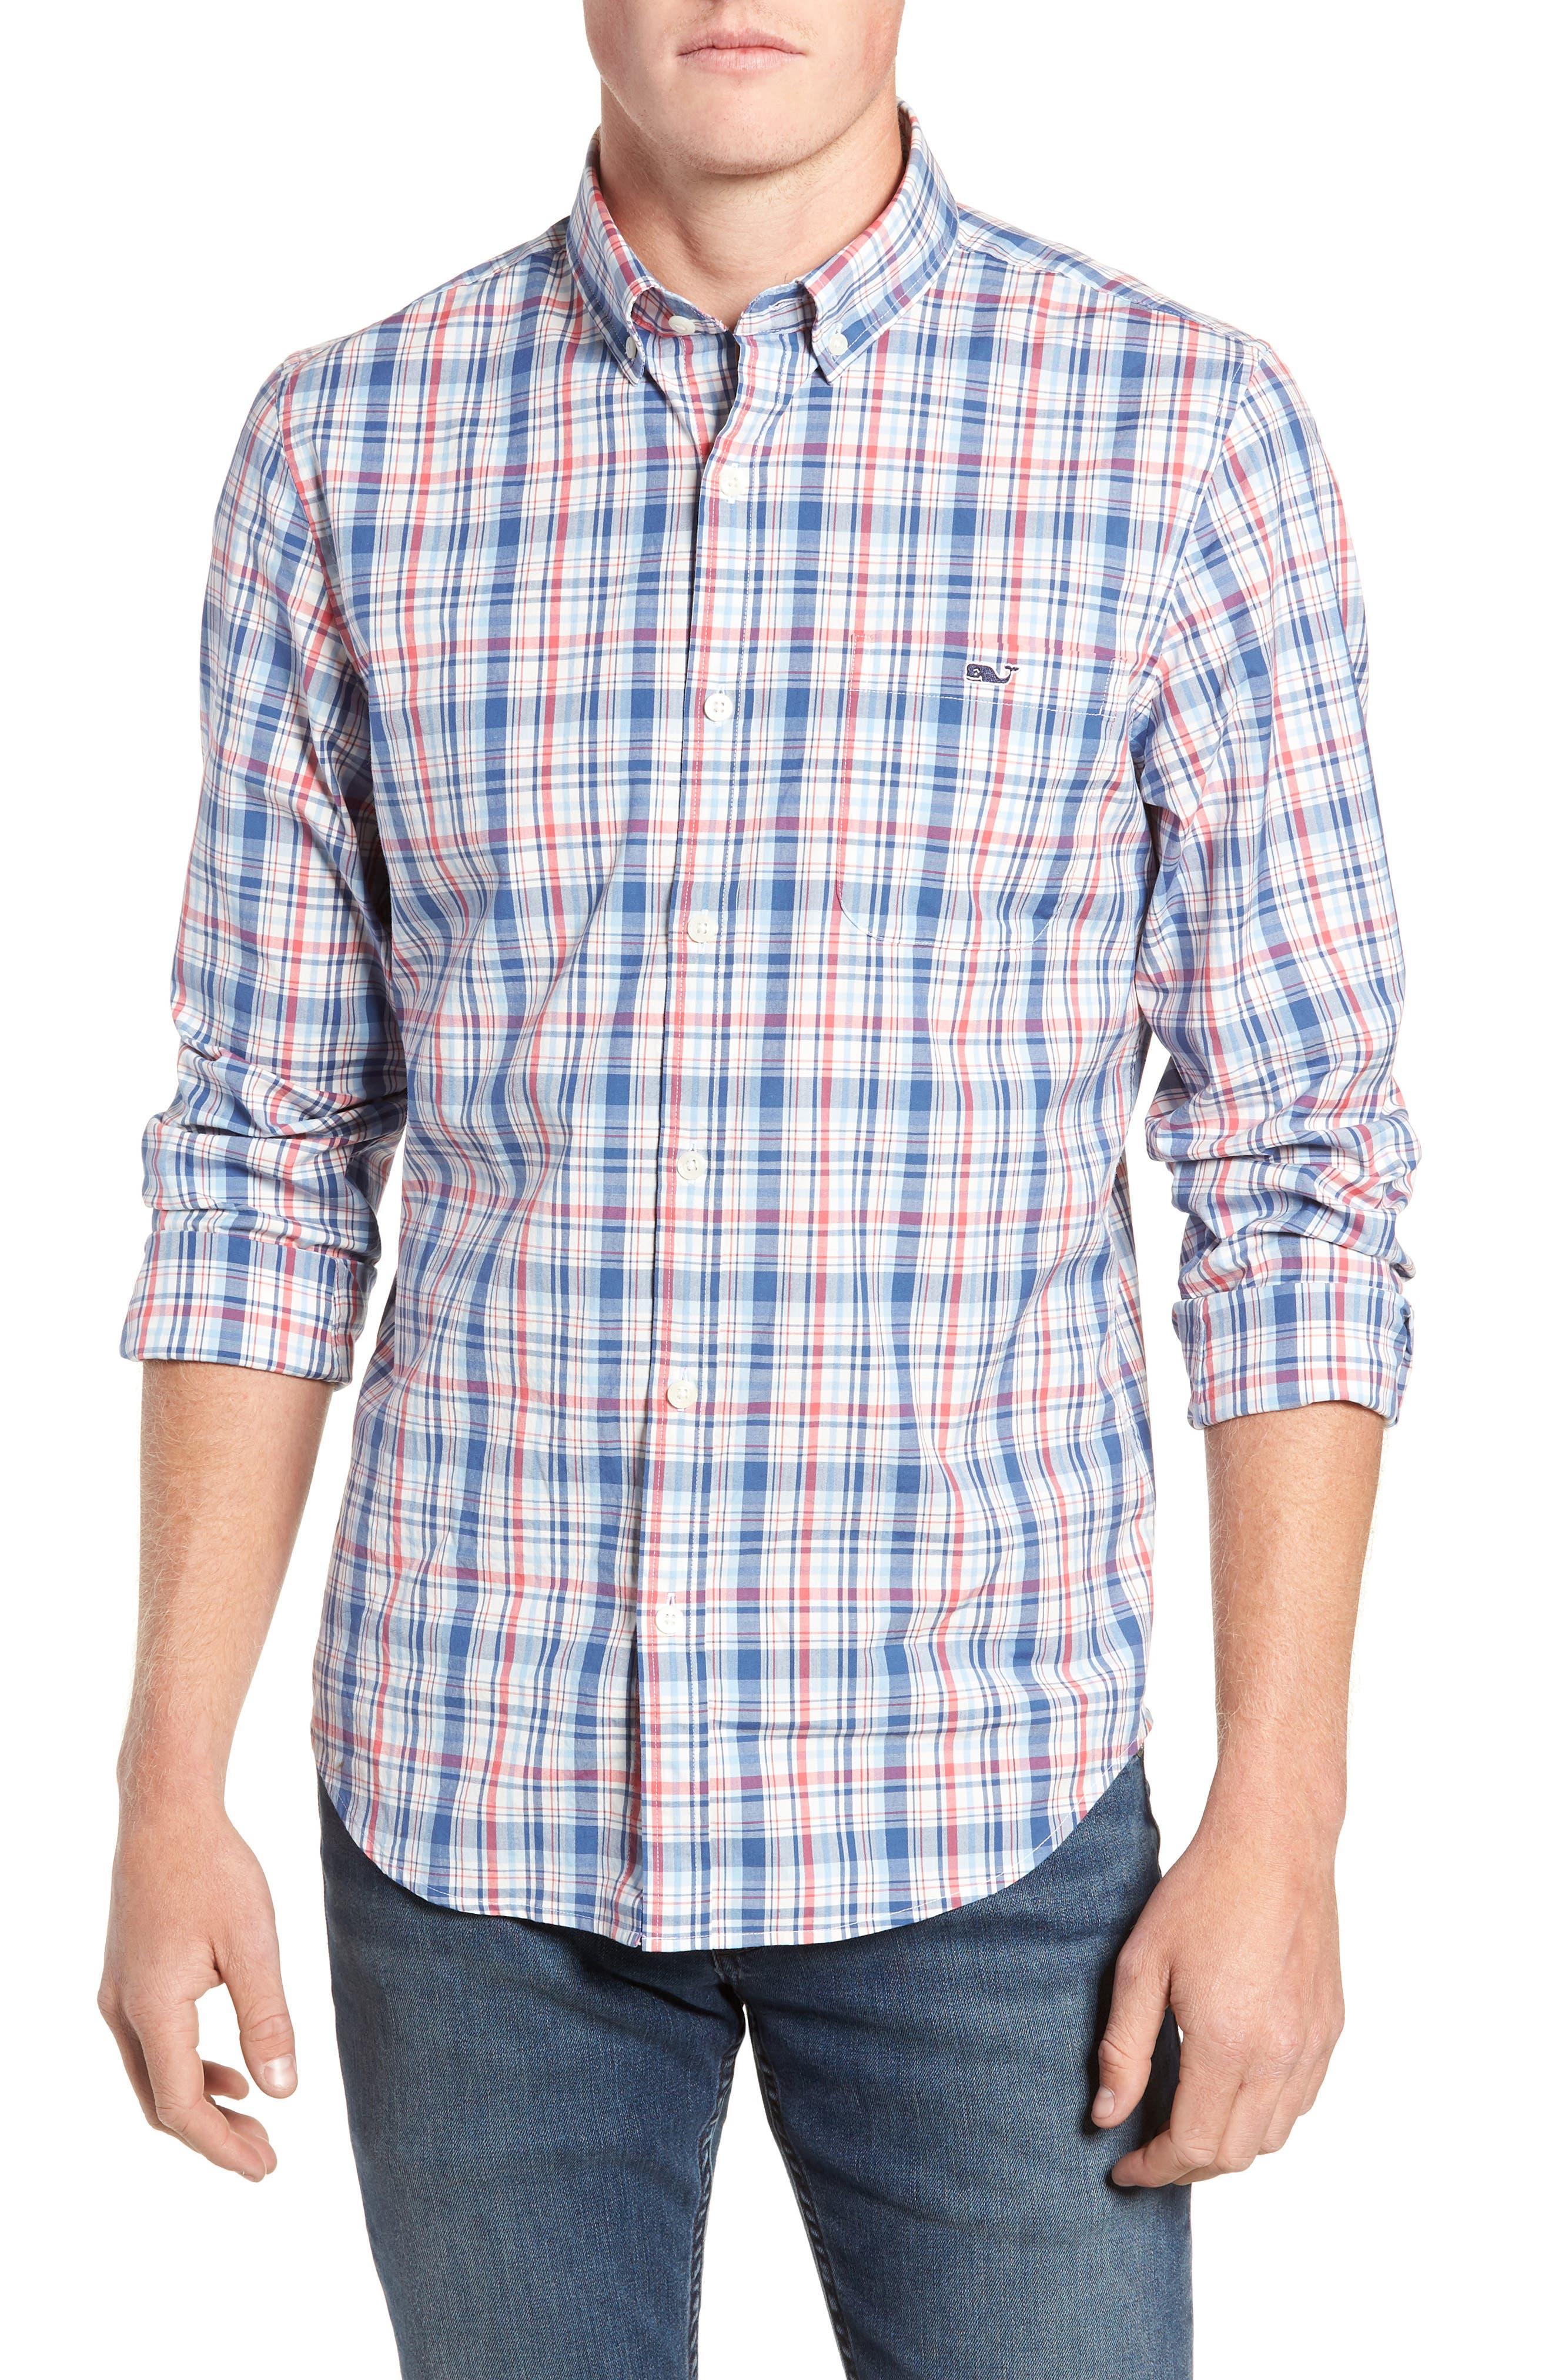 Duke's County Slim Fit Plaid Shirt,                             Main thumbnail 1, color,                             MOONSHINE